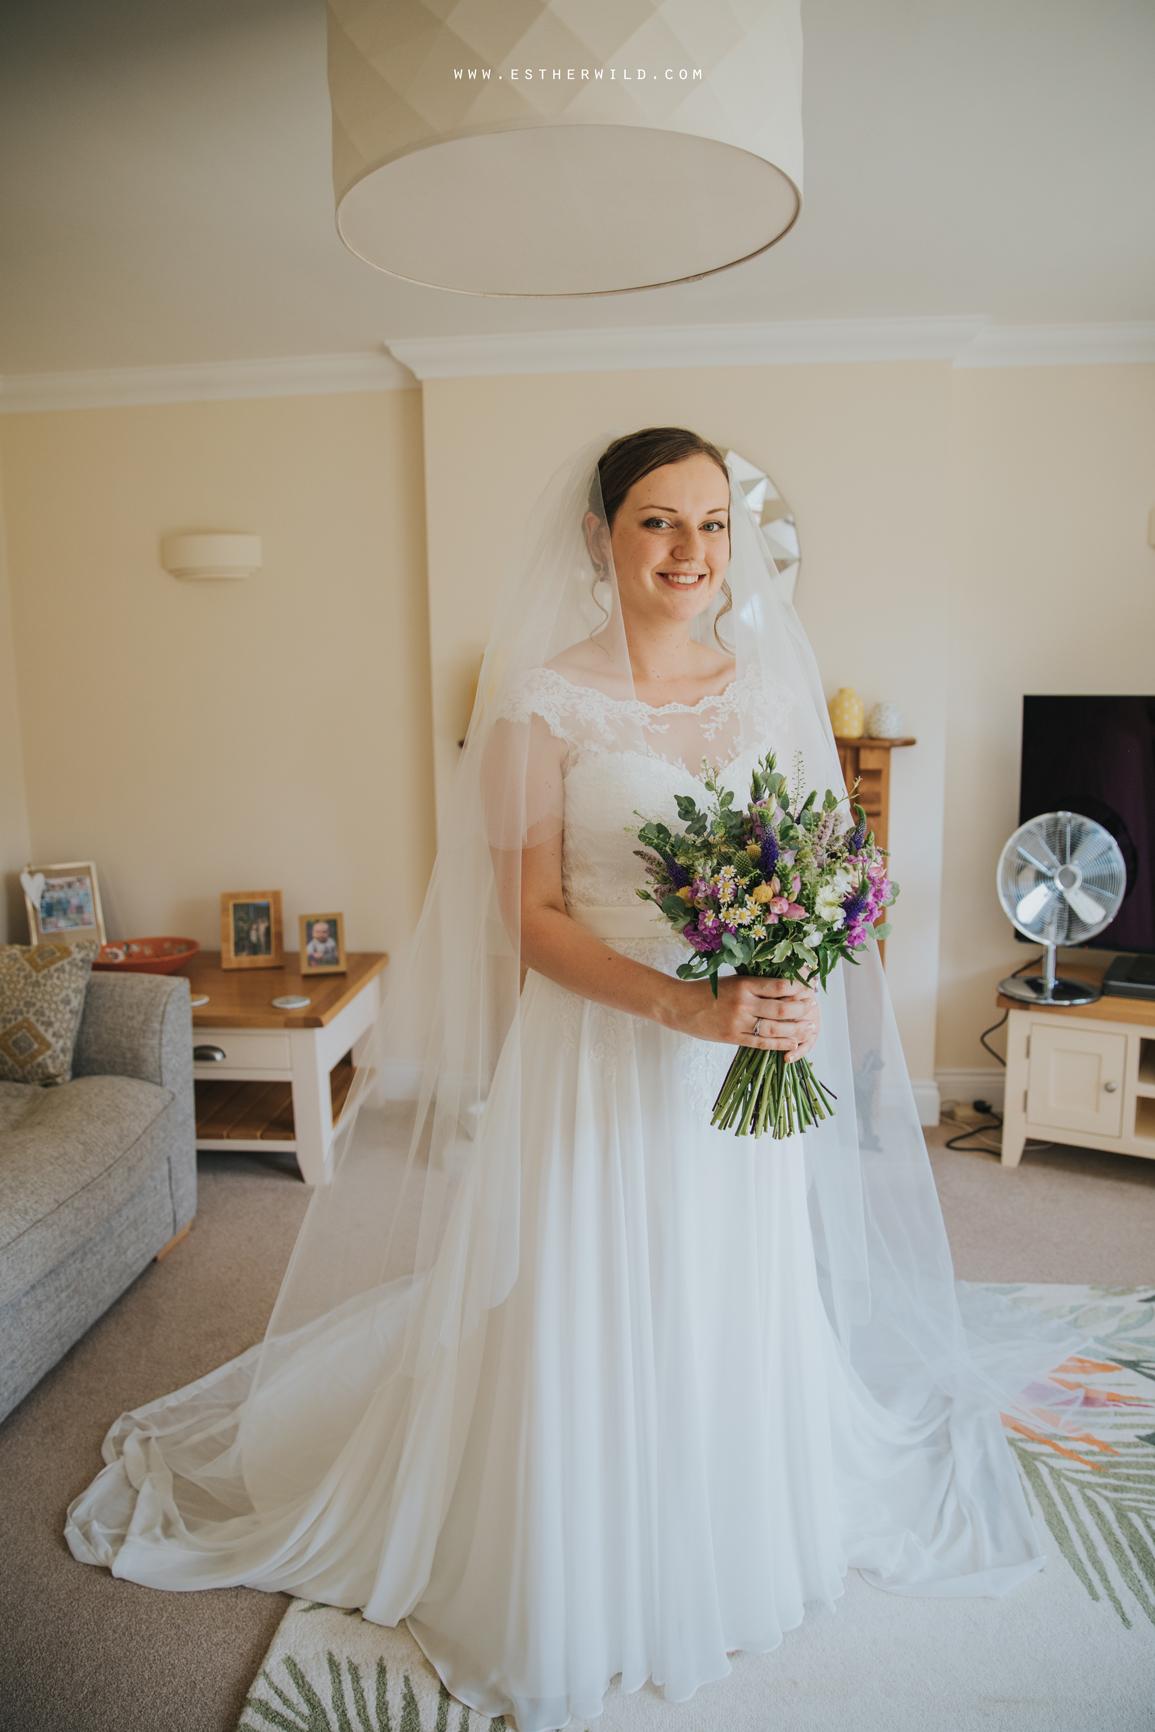 The_Georgian_Townhouse_Wedding_Norwich_Esther_Wild_Photographer_3R8A0584.jpg